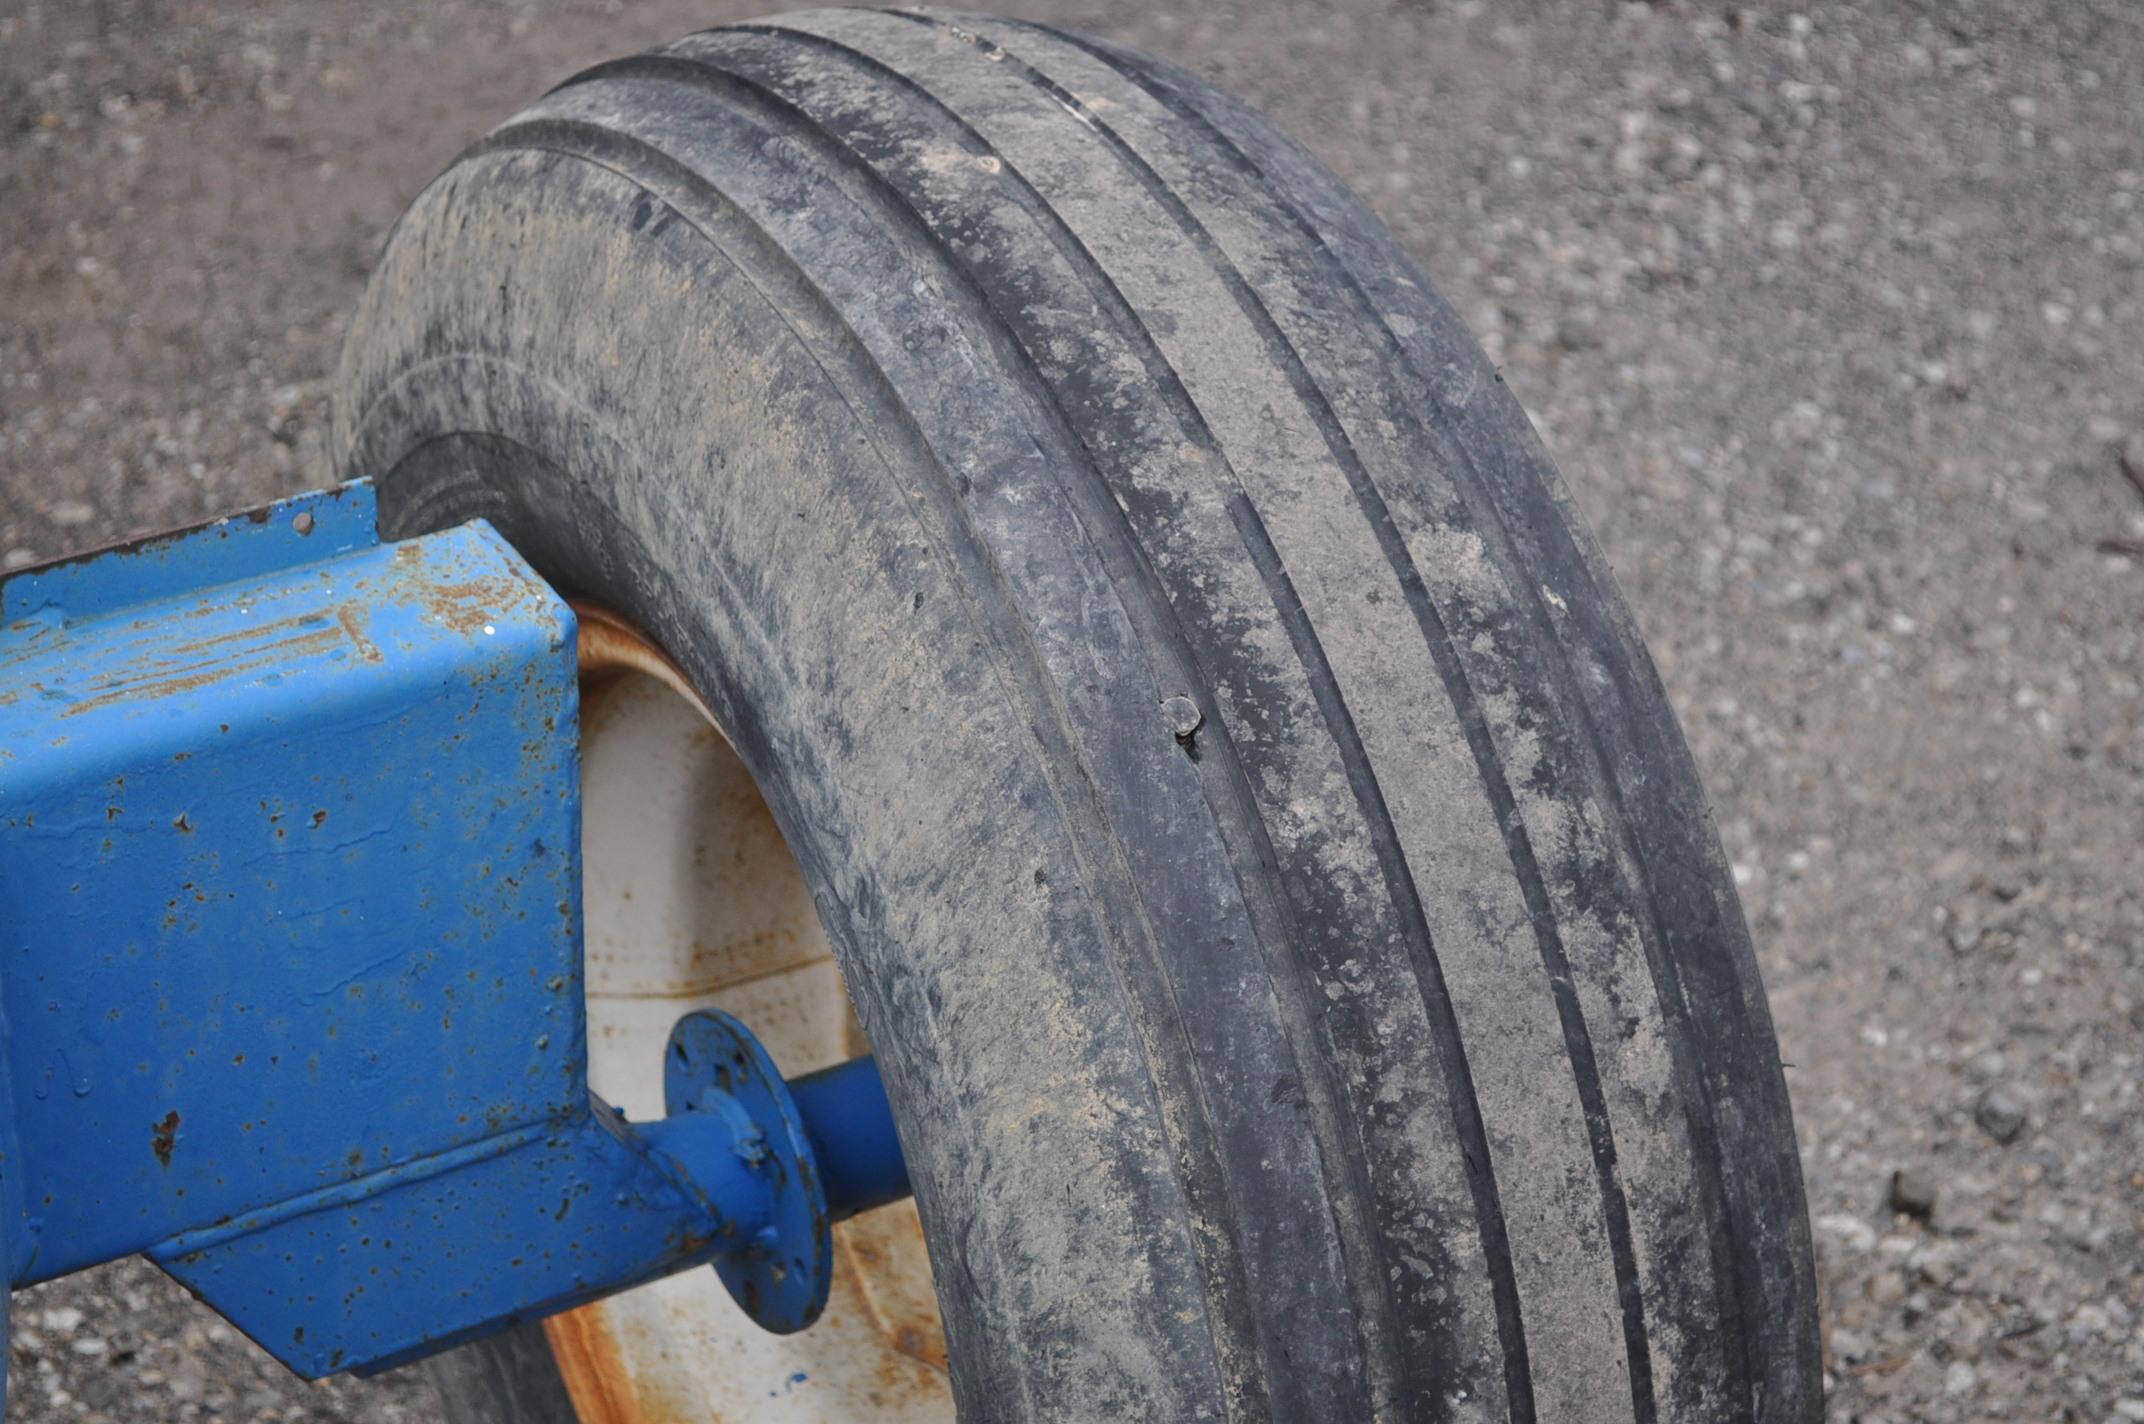 NH3 wagon gear - Image 6 of 8